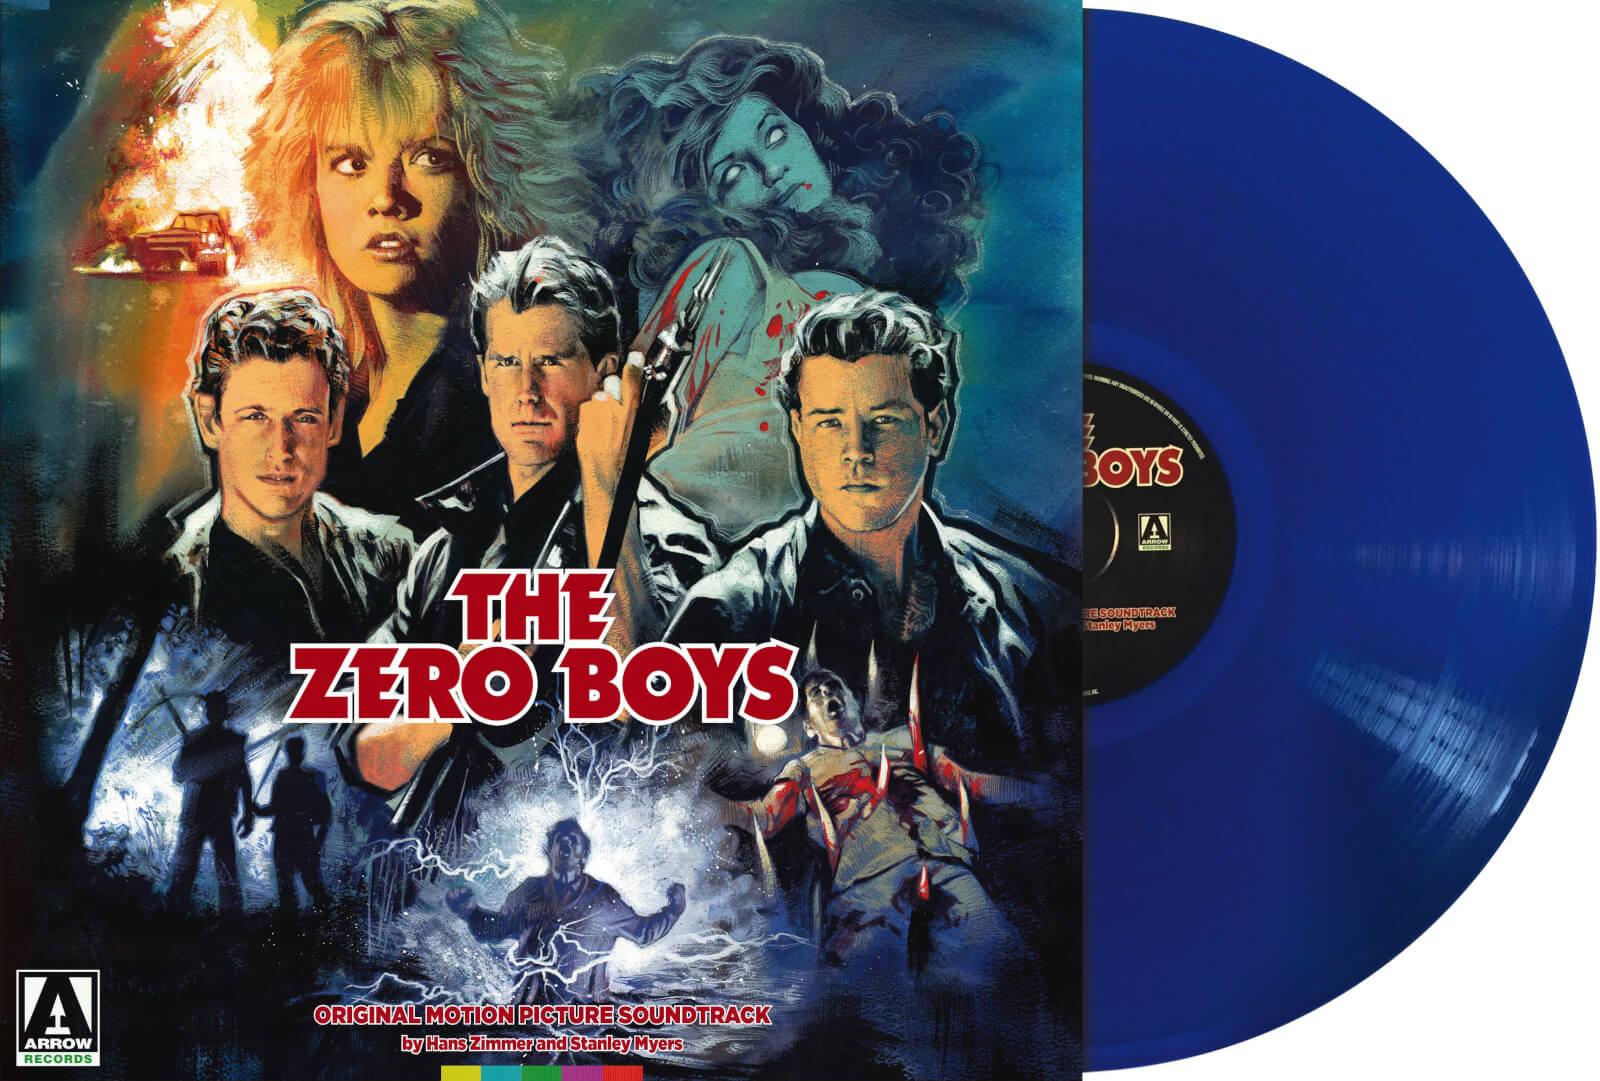 Arrow Video The Zero Boys - Blue Vinyl (1LP)